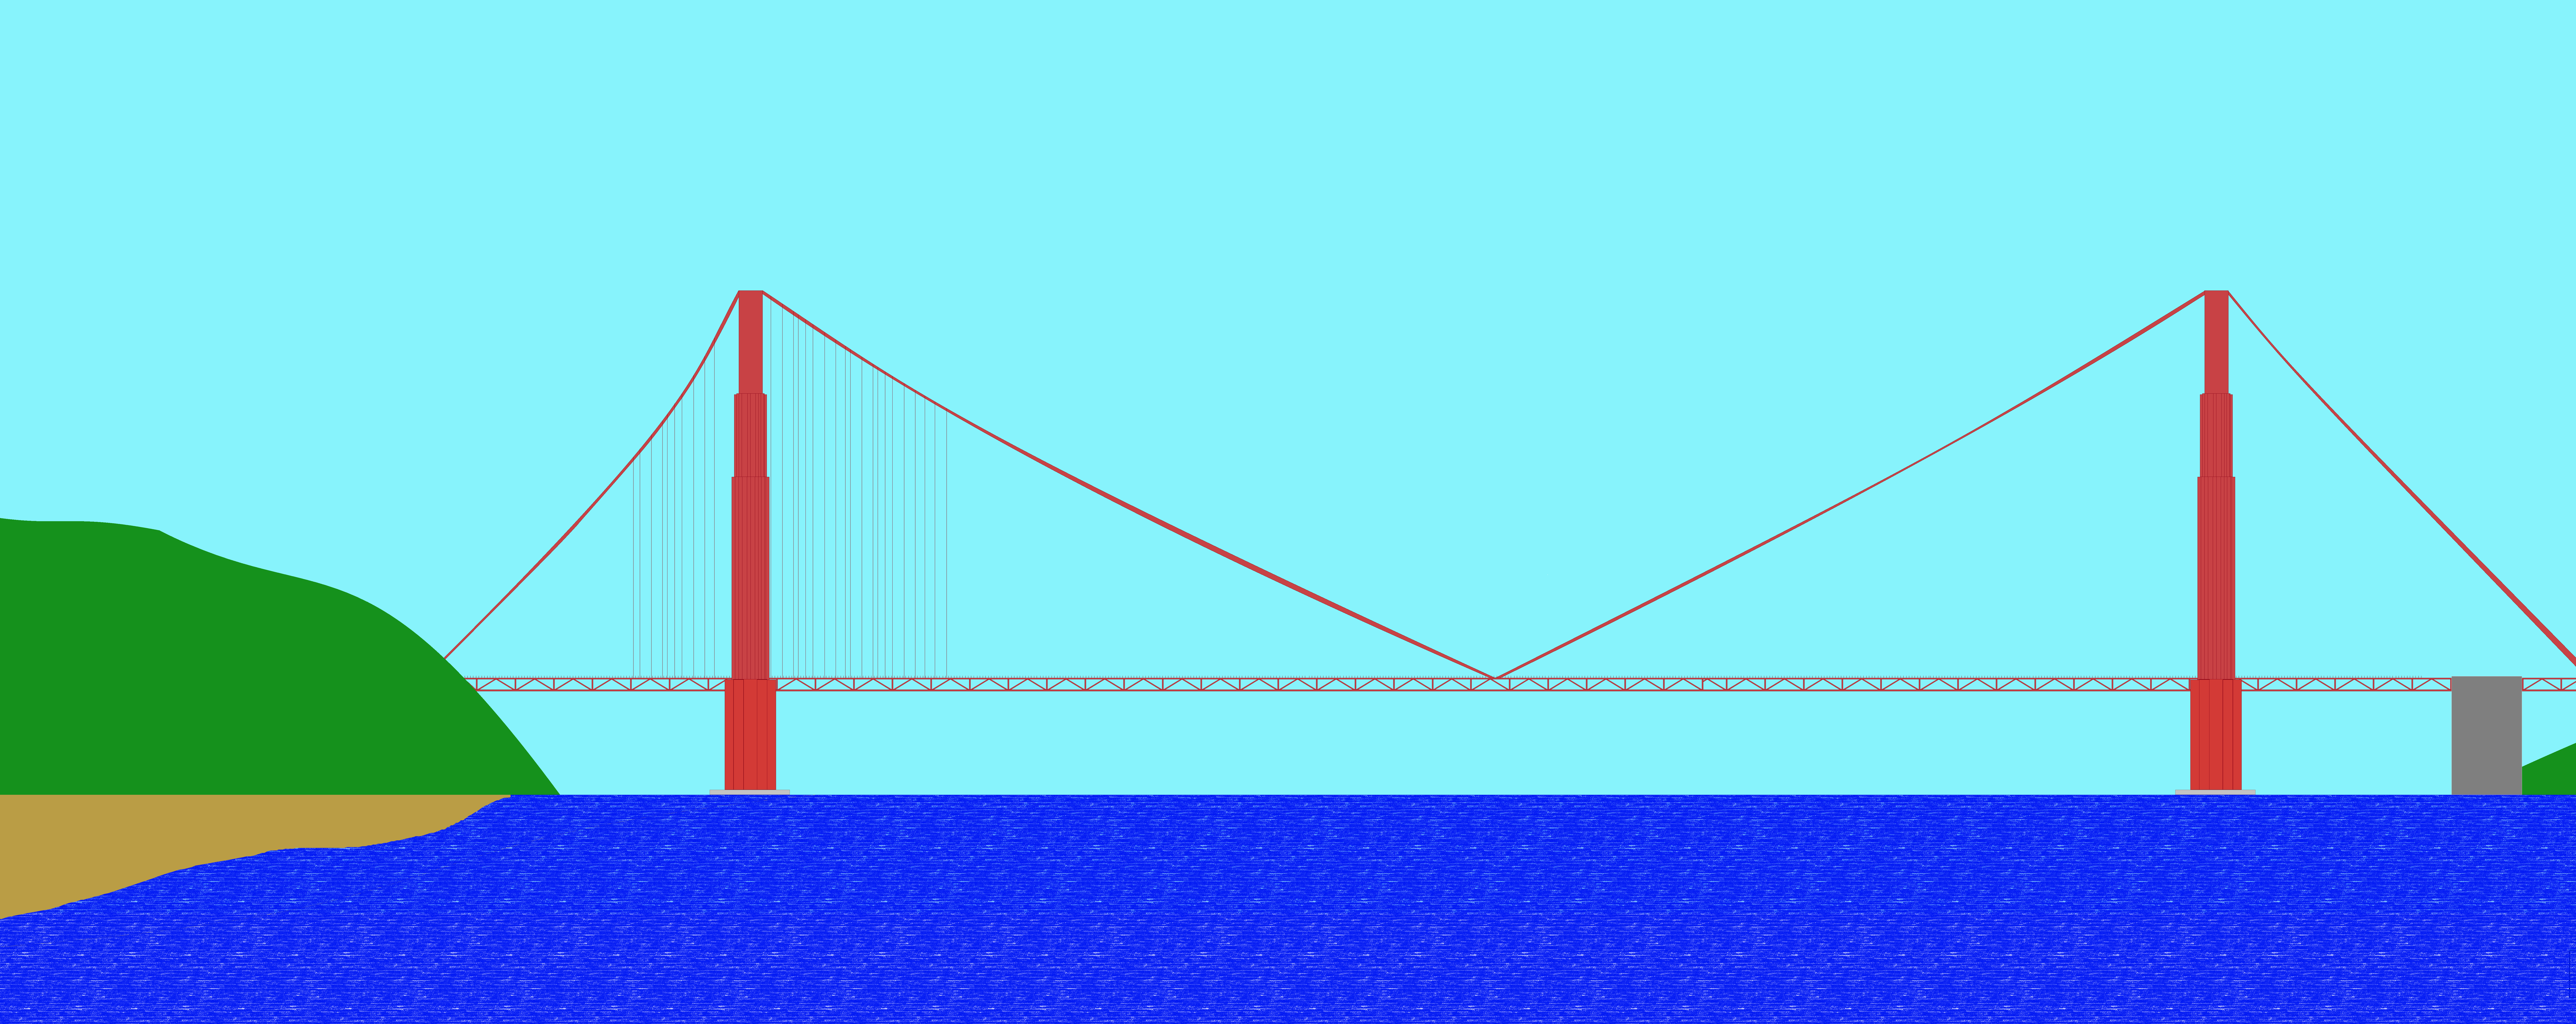 Golden Gate Bridge By 03garyjohnson On Deviantart Diagram Of The